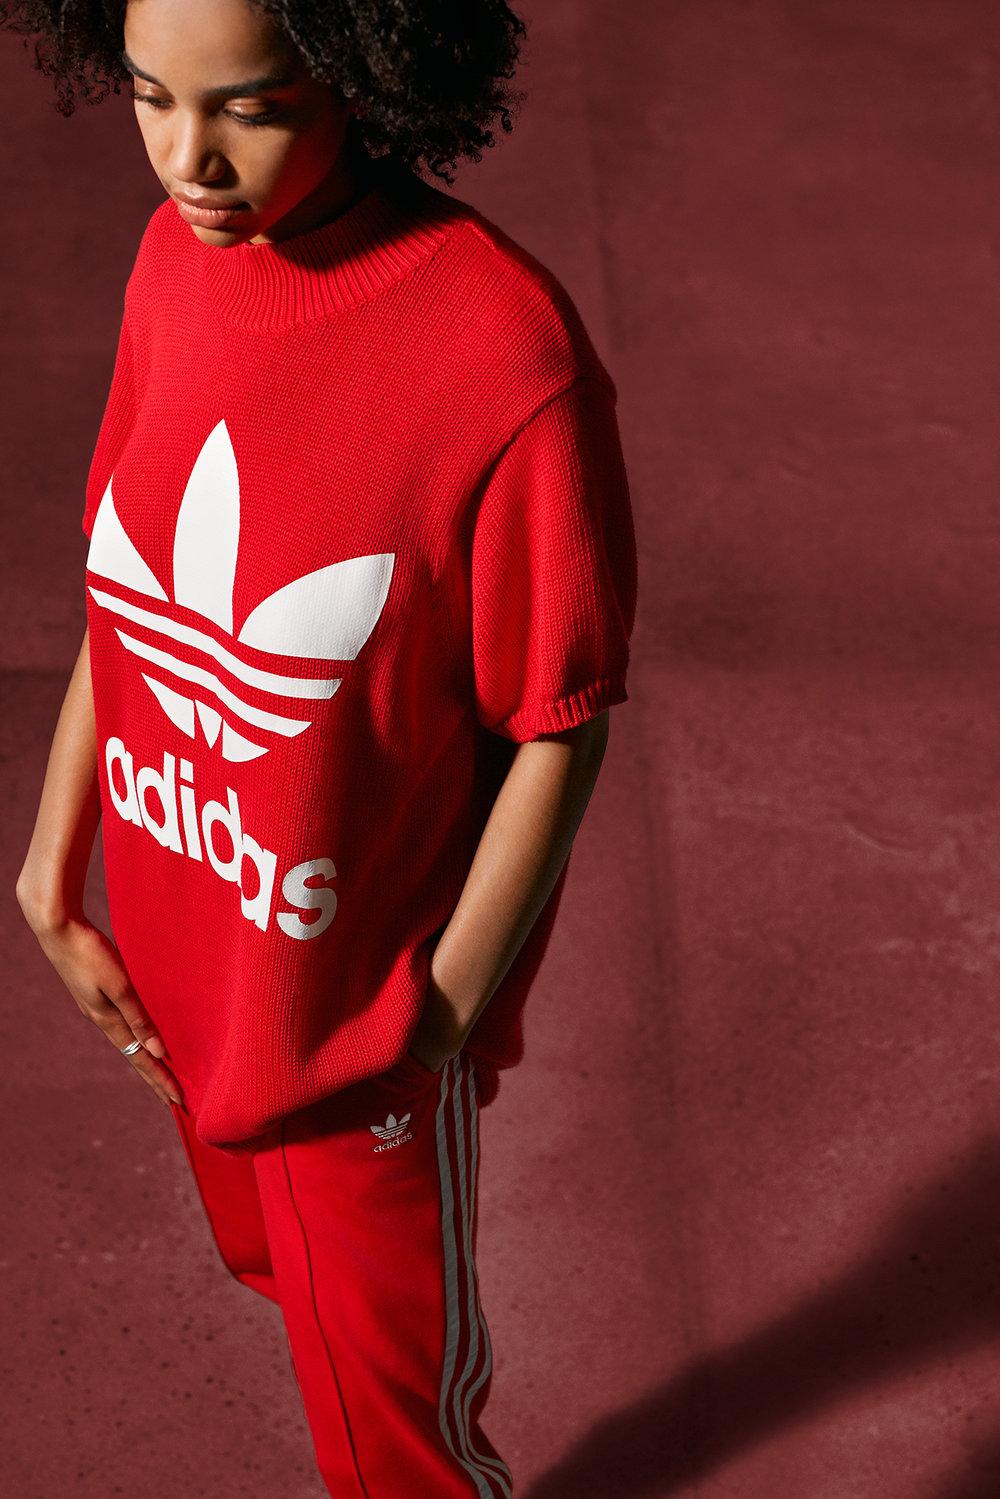 Adidas_Adicolor5.jpg